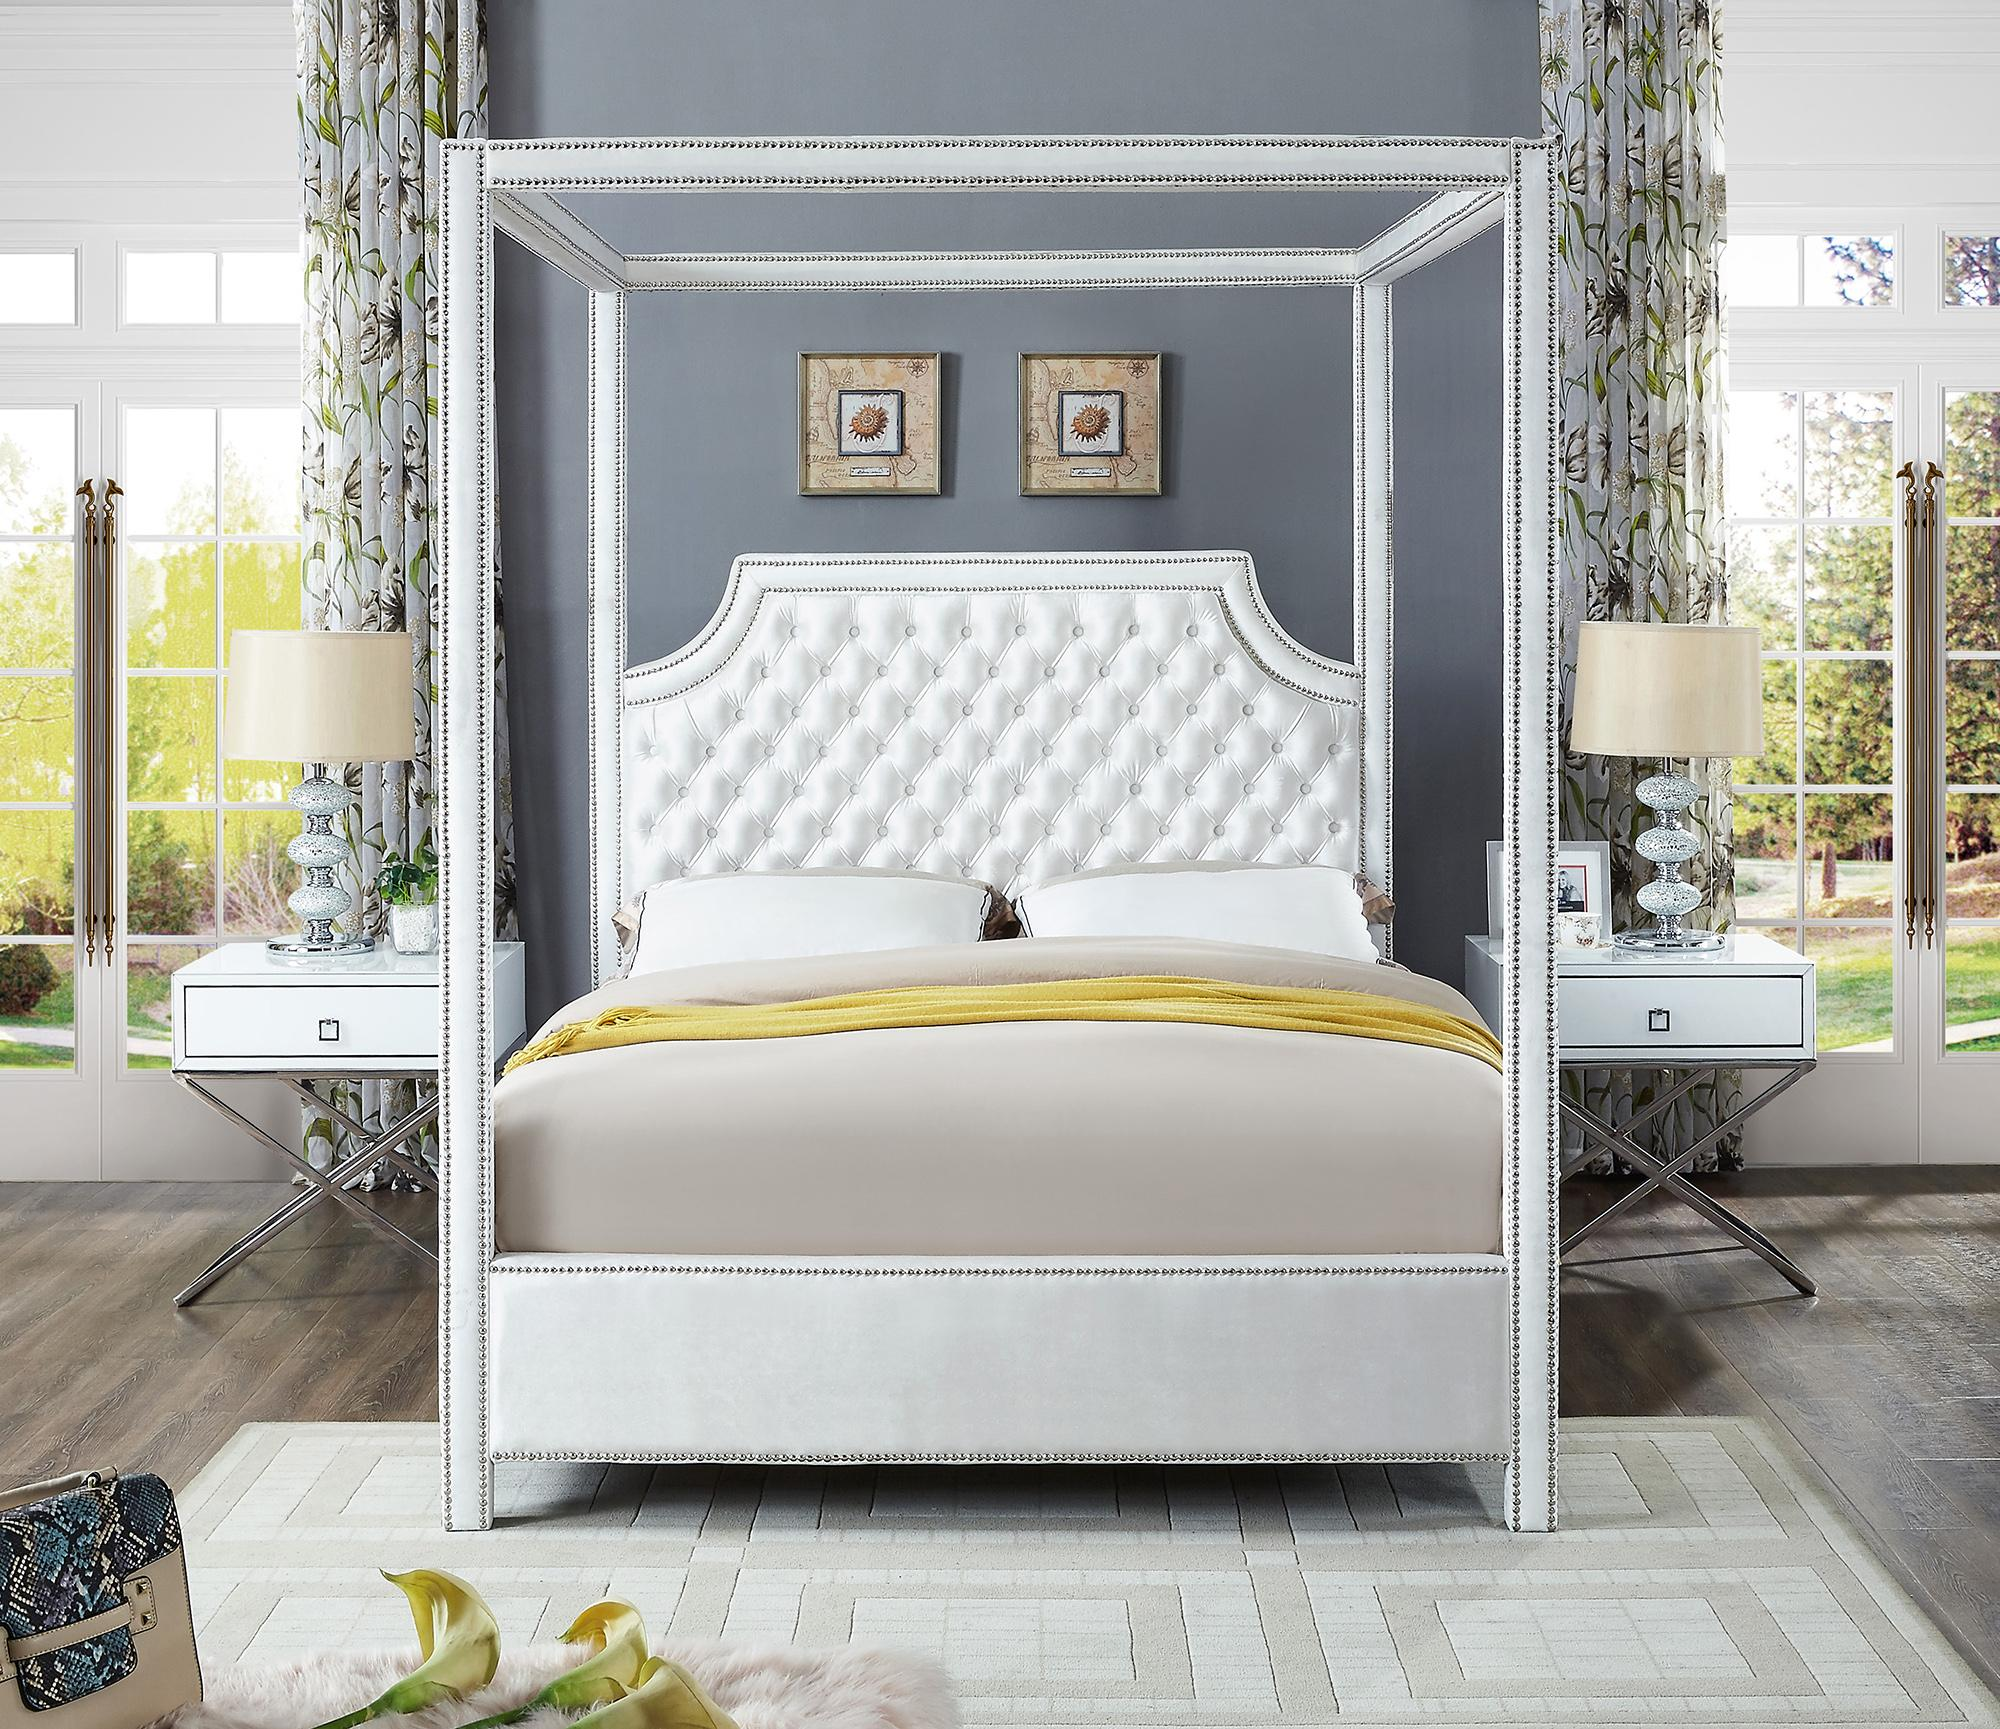 White Velvet Queen Canopy Bed W Side Tables Set 3ps Meridian Furniture Rowan Rowanwhite Q Set 3